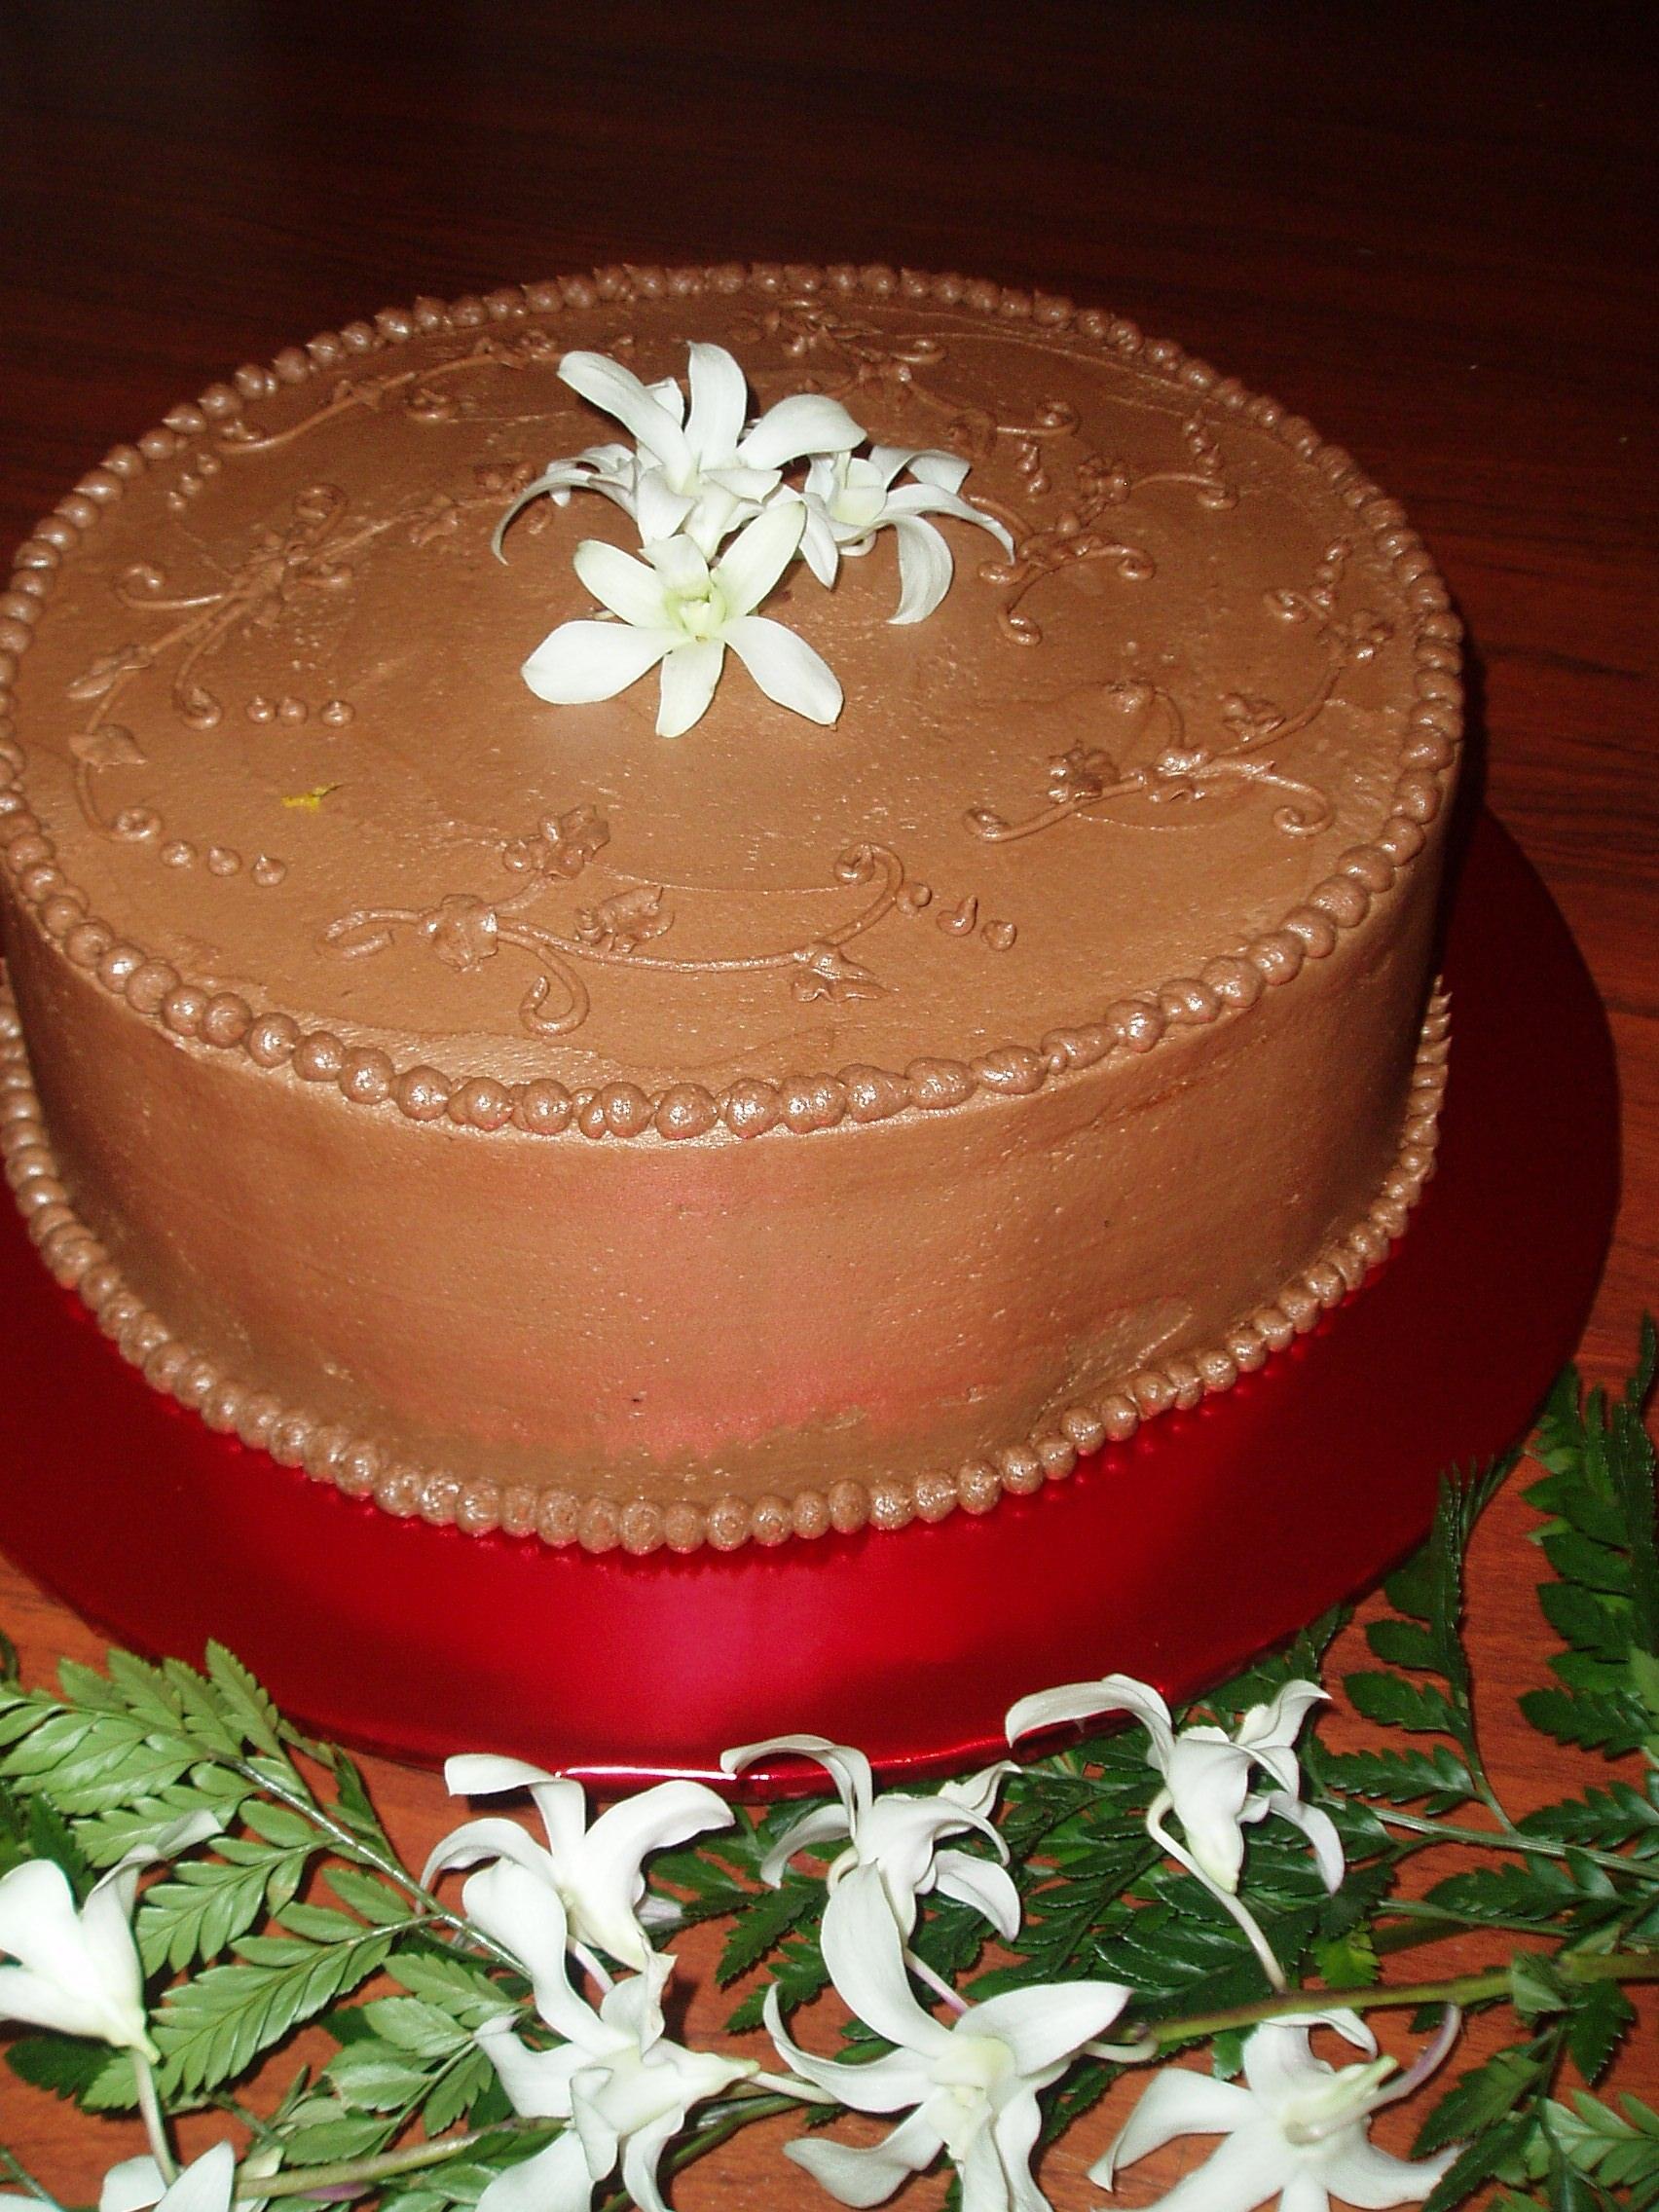 Chocolate frosting cake.JPG